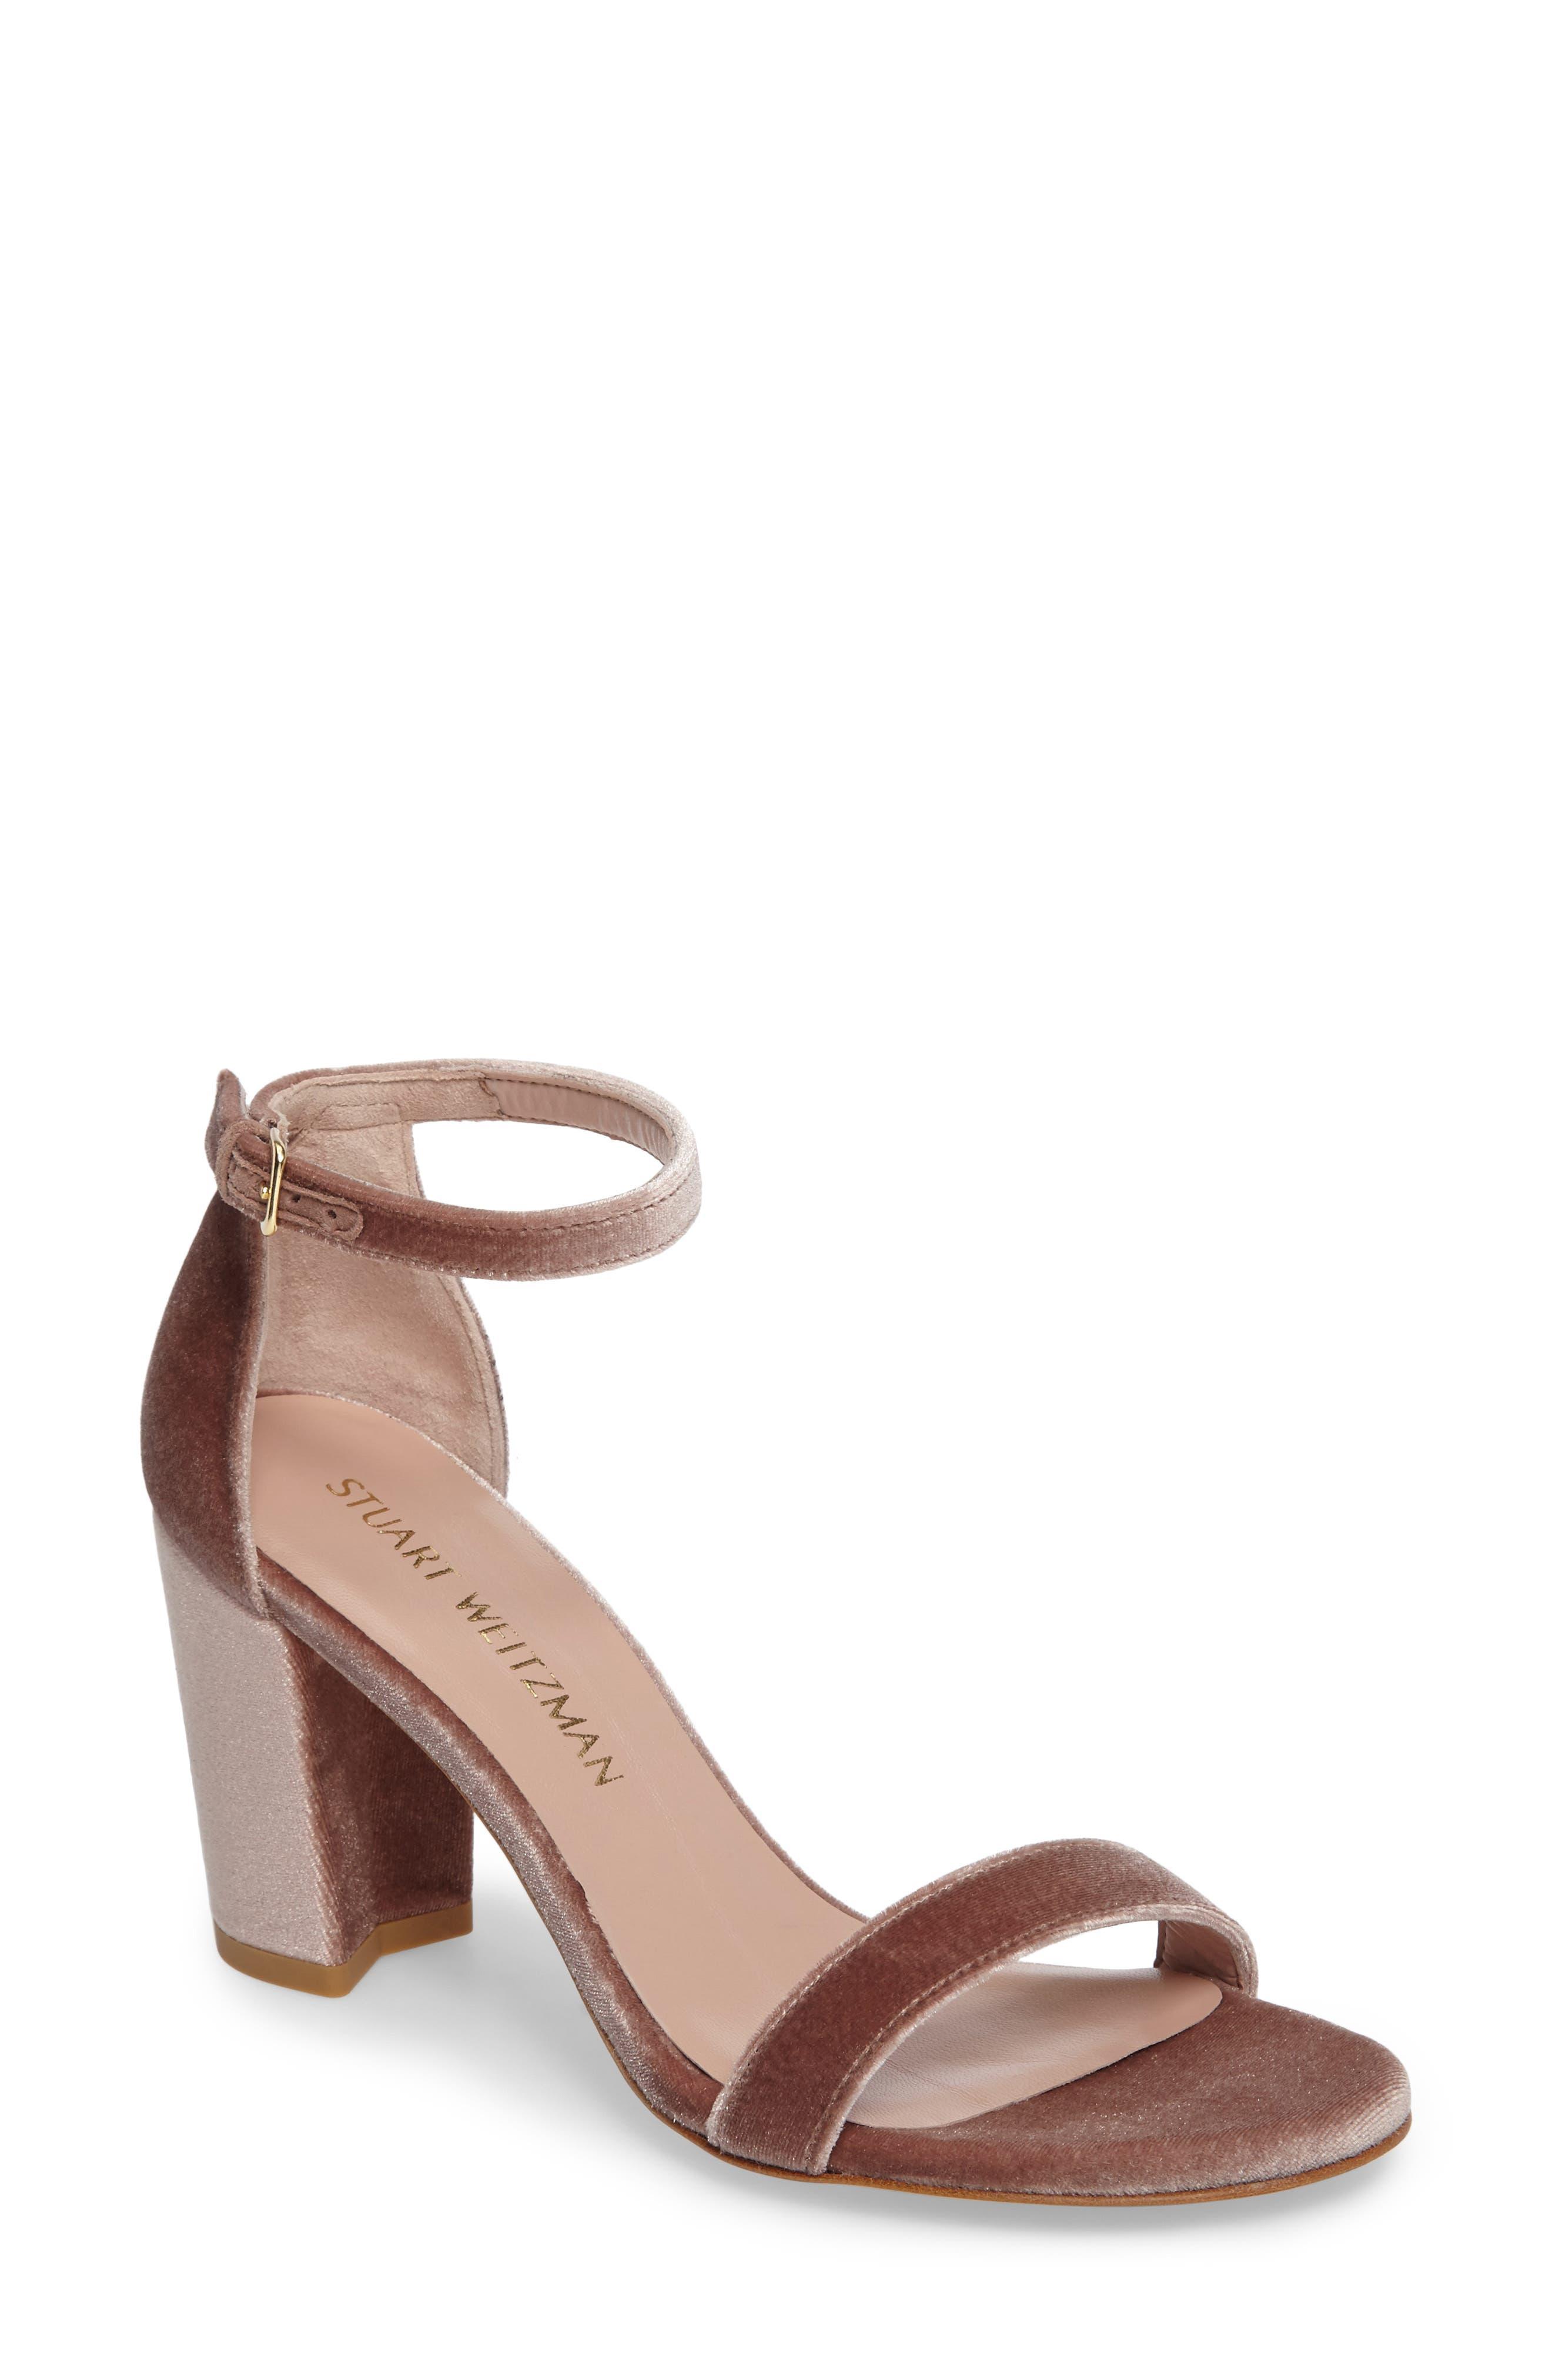 NearlyNude Ankle Strap Sandal,                         Main,                         color, Candy Velvet